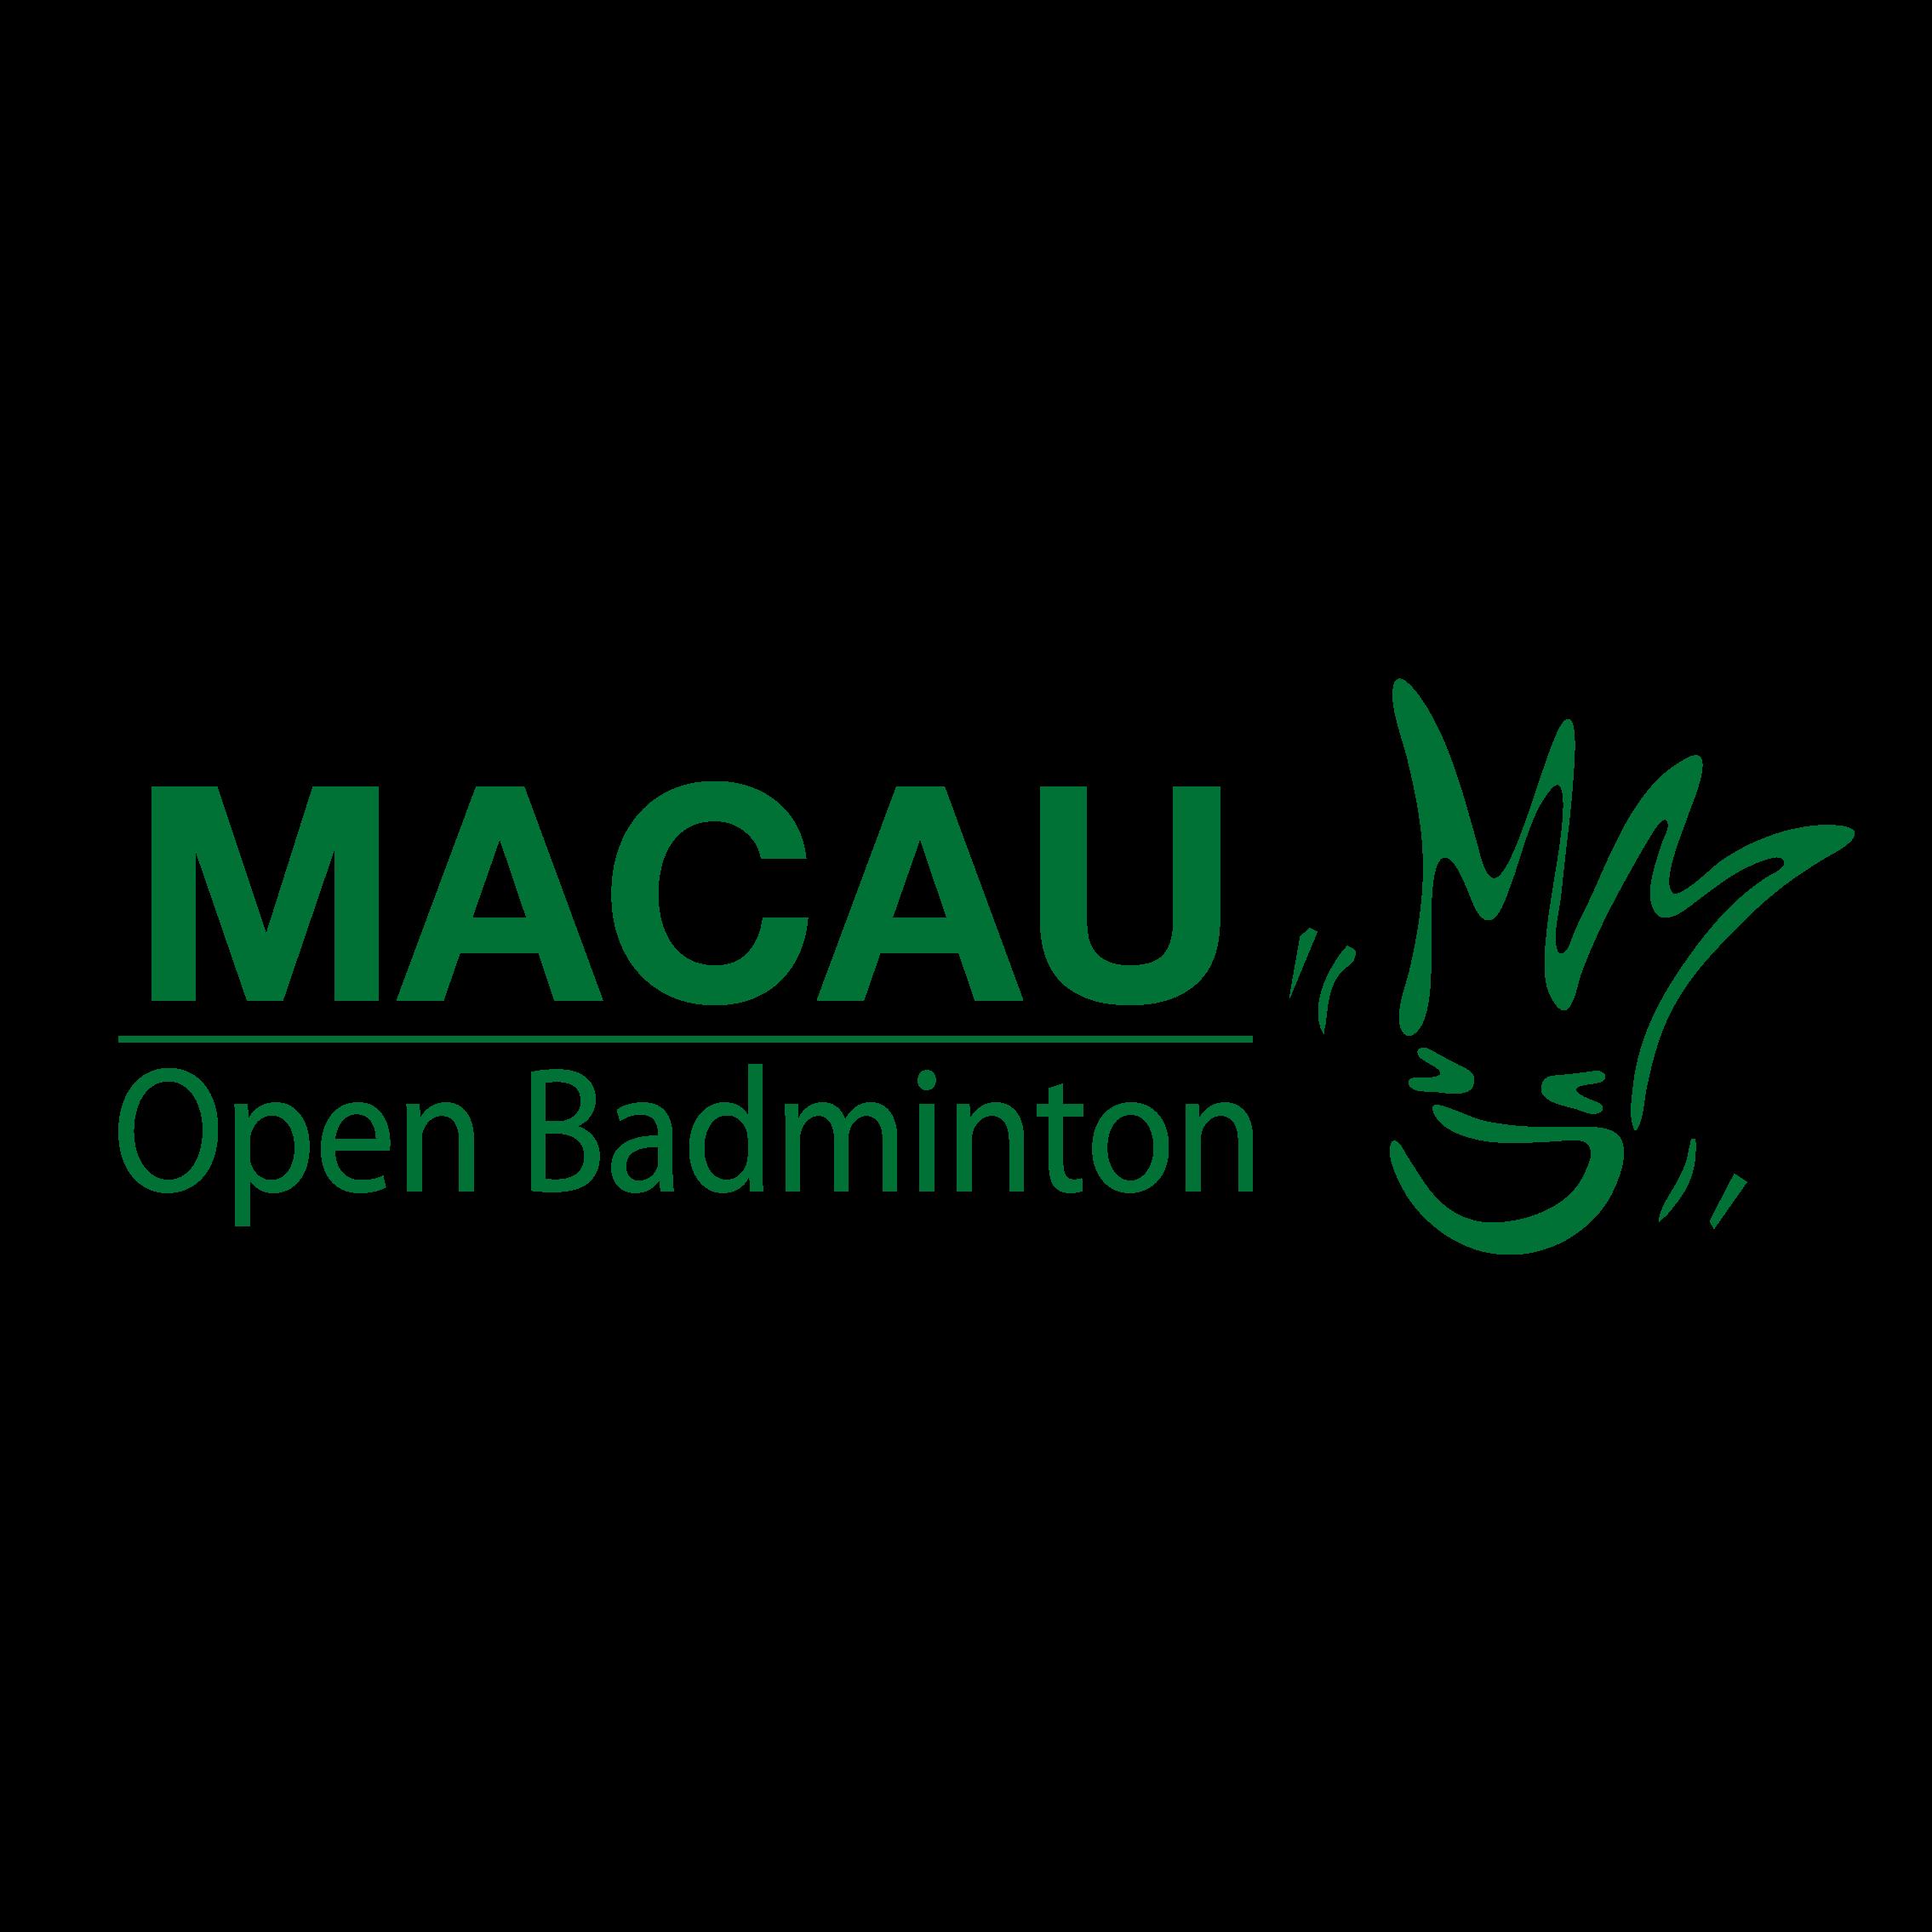 2019 BWF Badminton World Tour - Macau Open